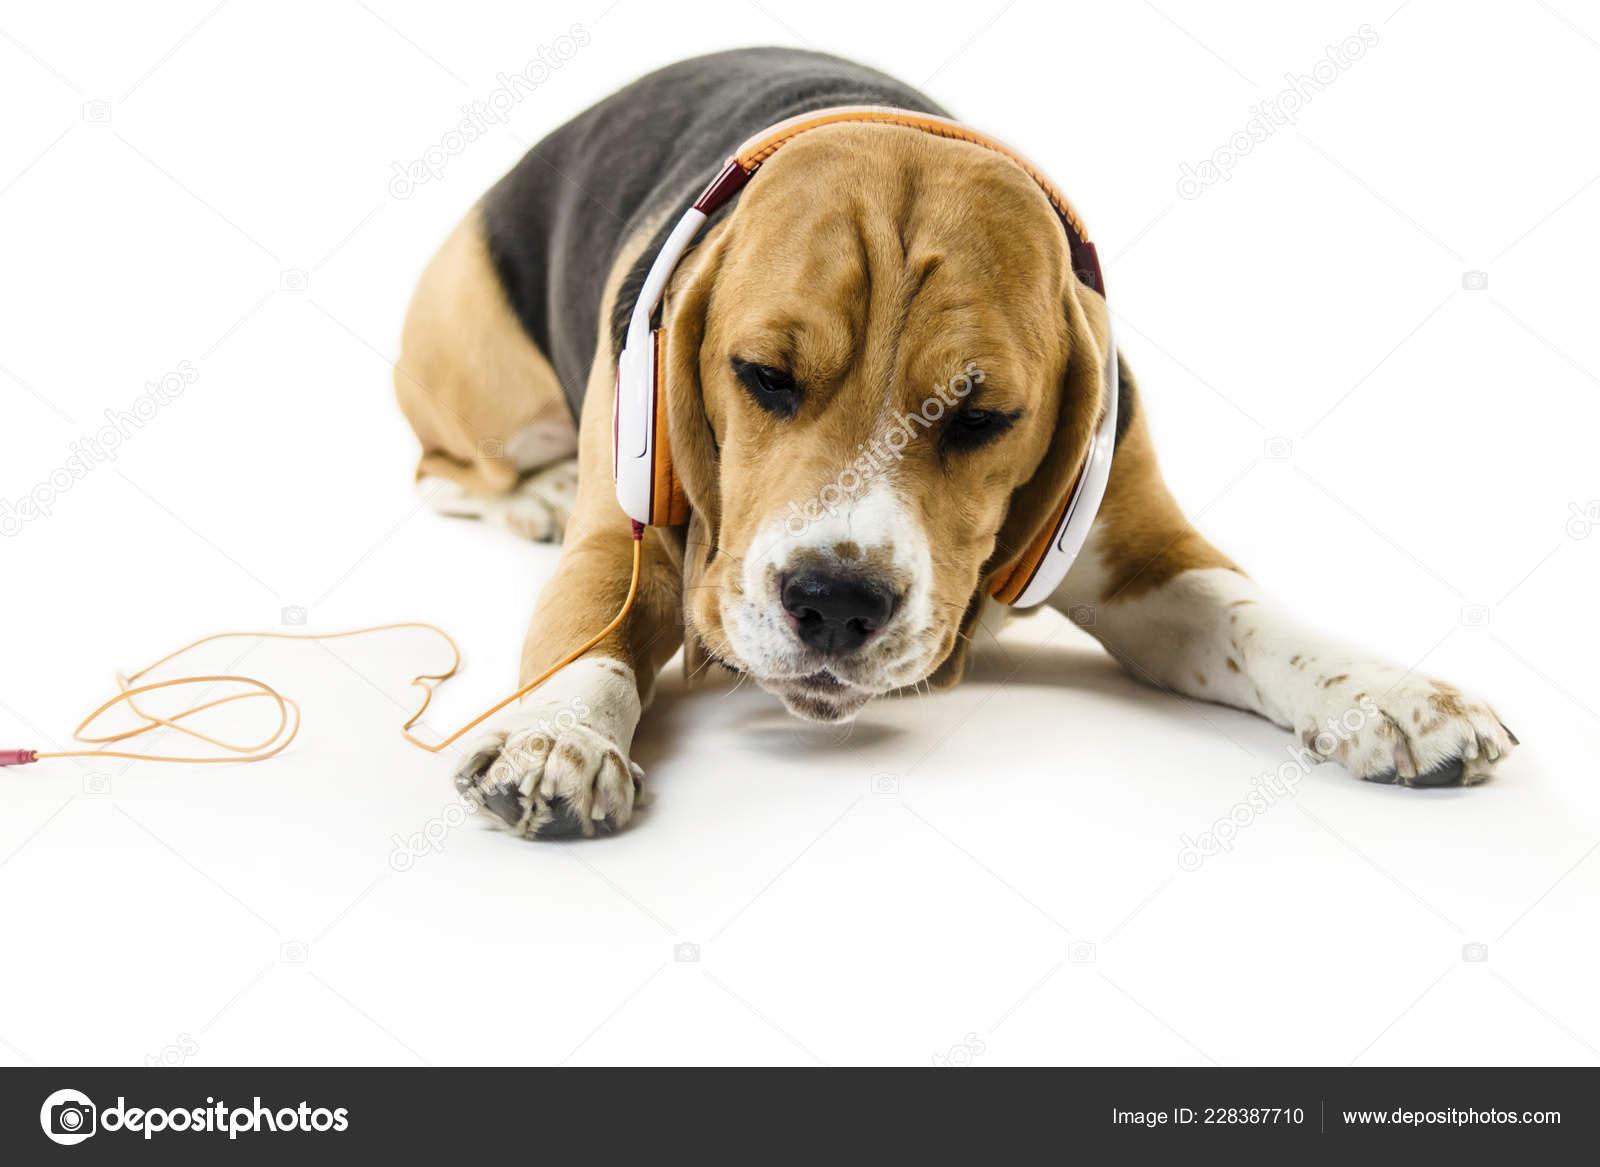 Funny Beagle Dog Headphones Listening Music White Background Stock Photo C Mikitiger 228387710